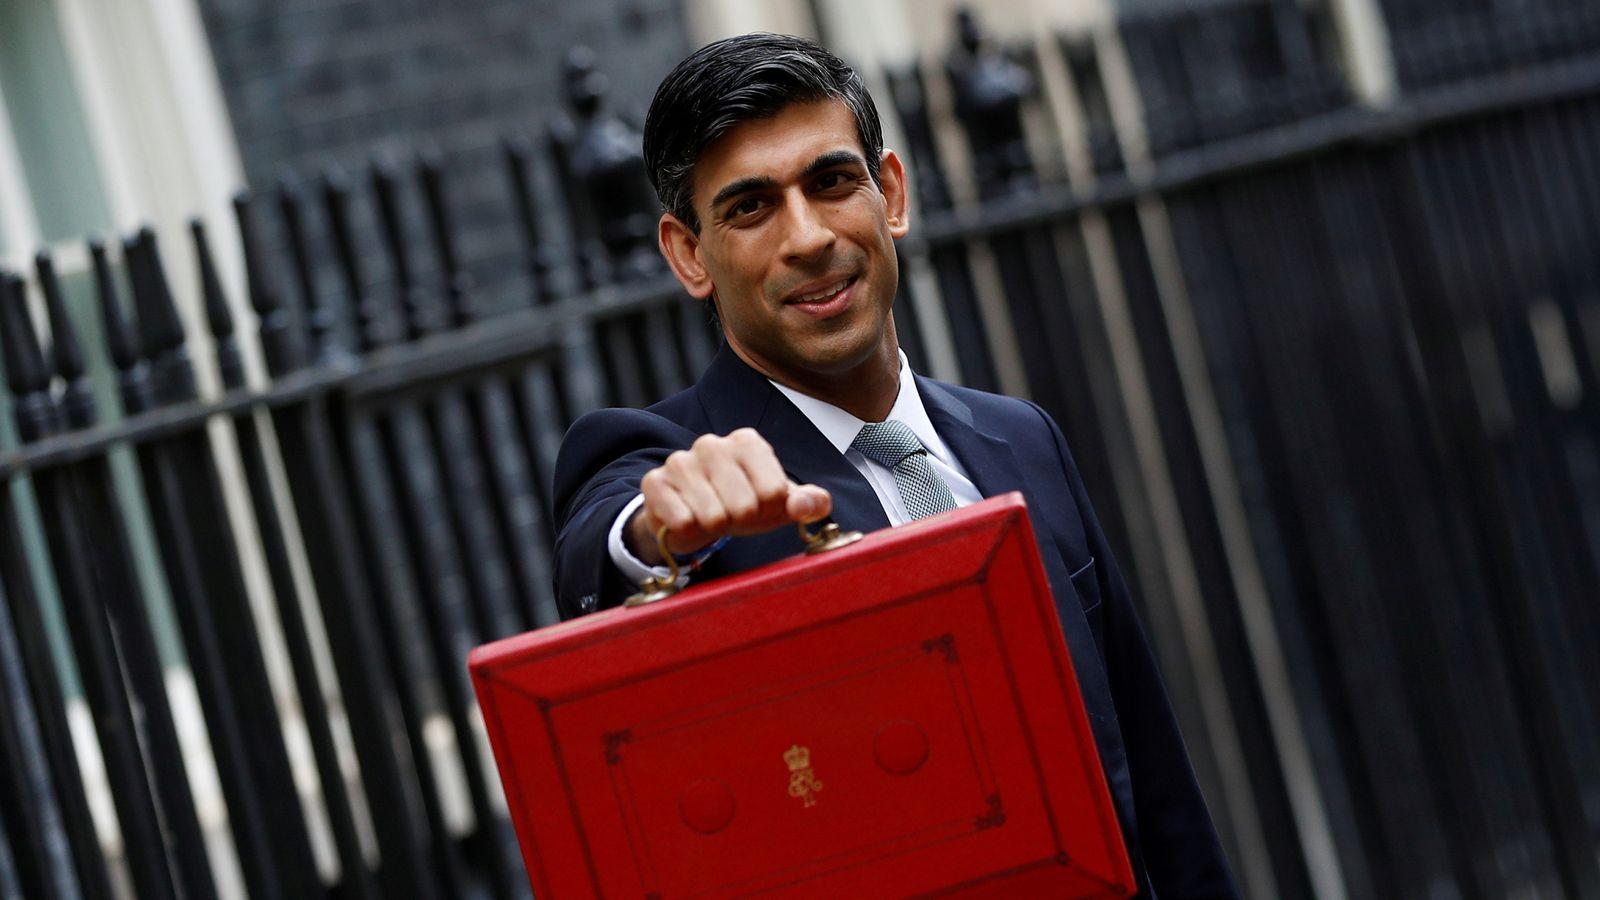 Budget 2021: Rishi Sunak plans £520m Help to Grow scheme for small firms